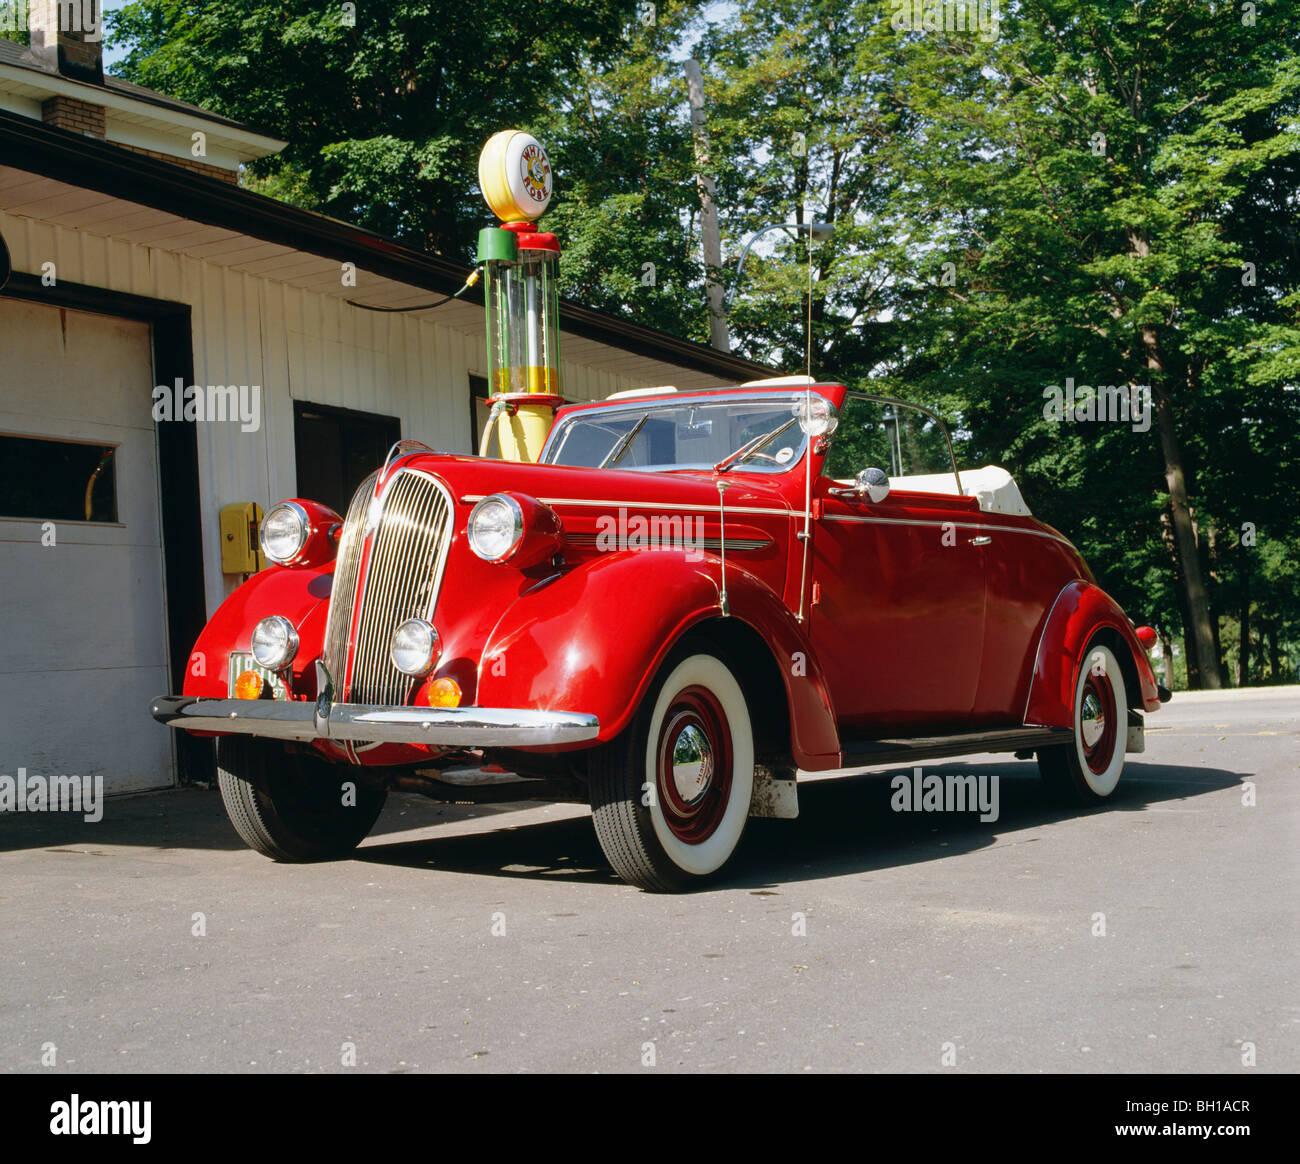 Car Stock Photos: 1937 Car Stock Photos & 1937 Car Stock Images